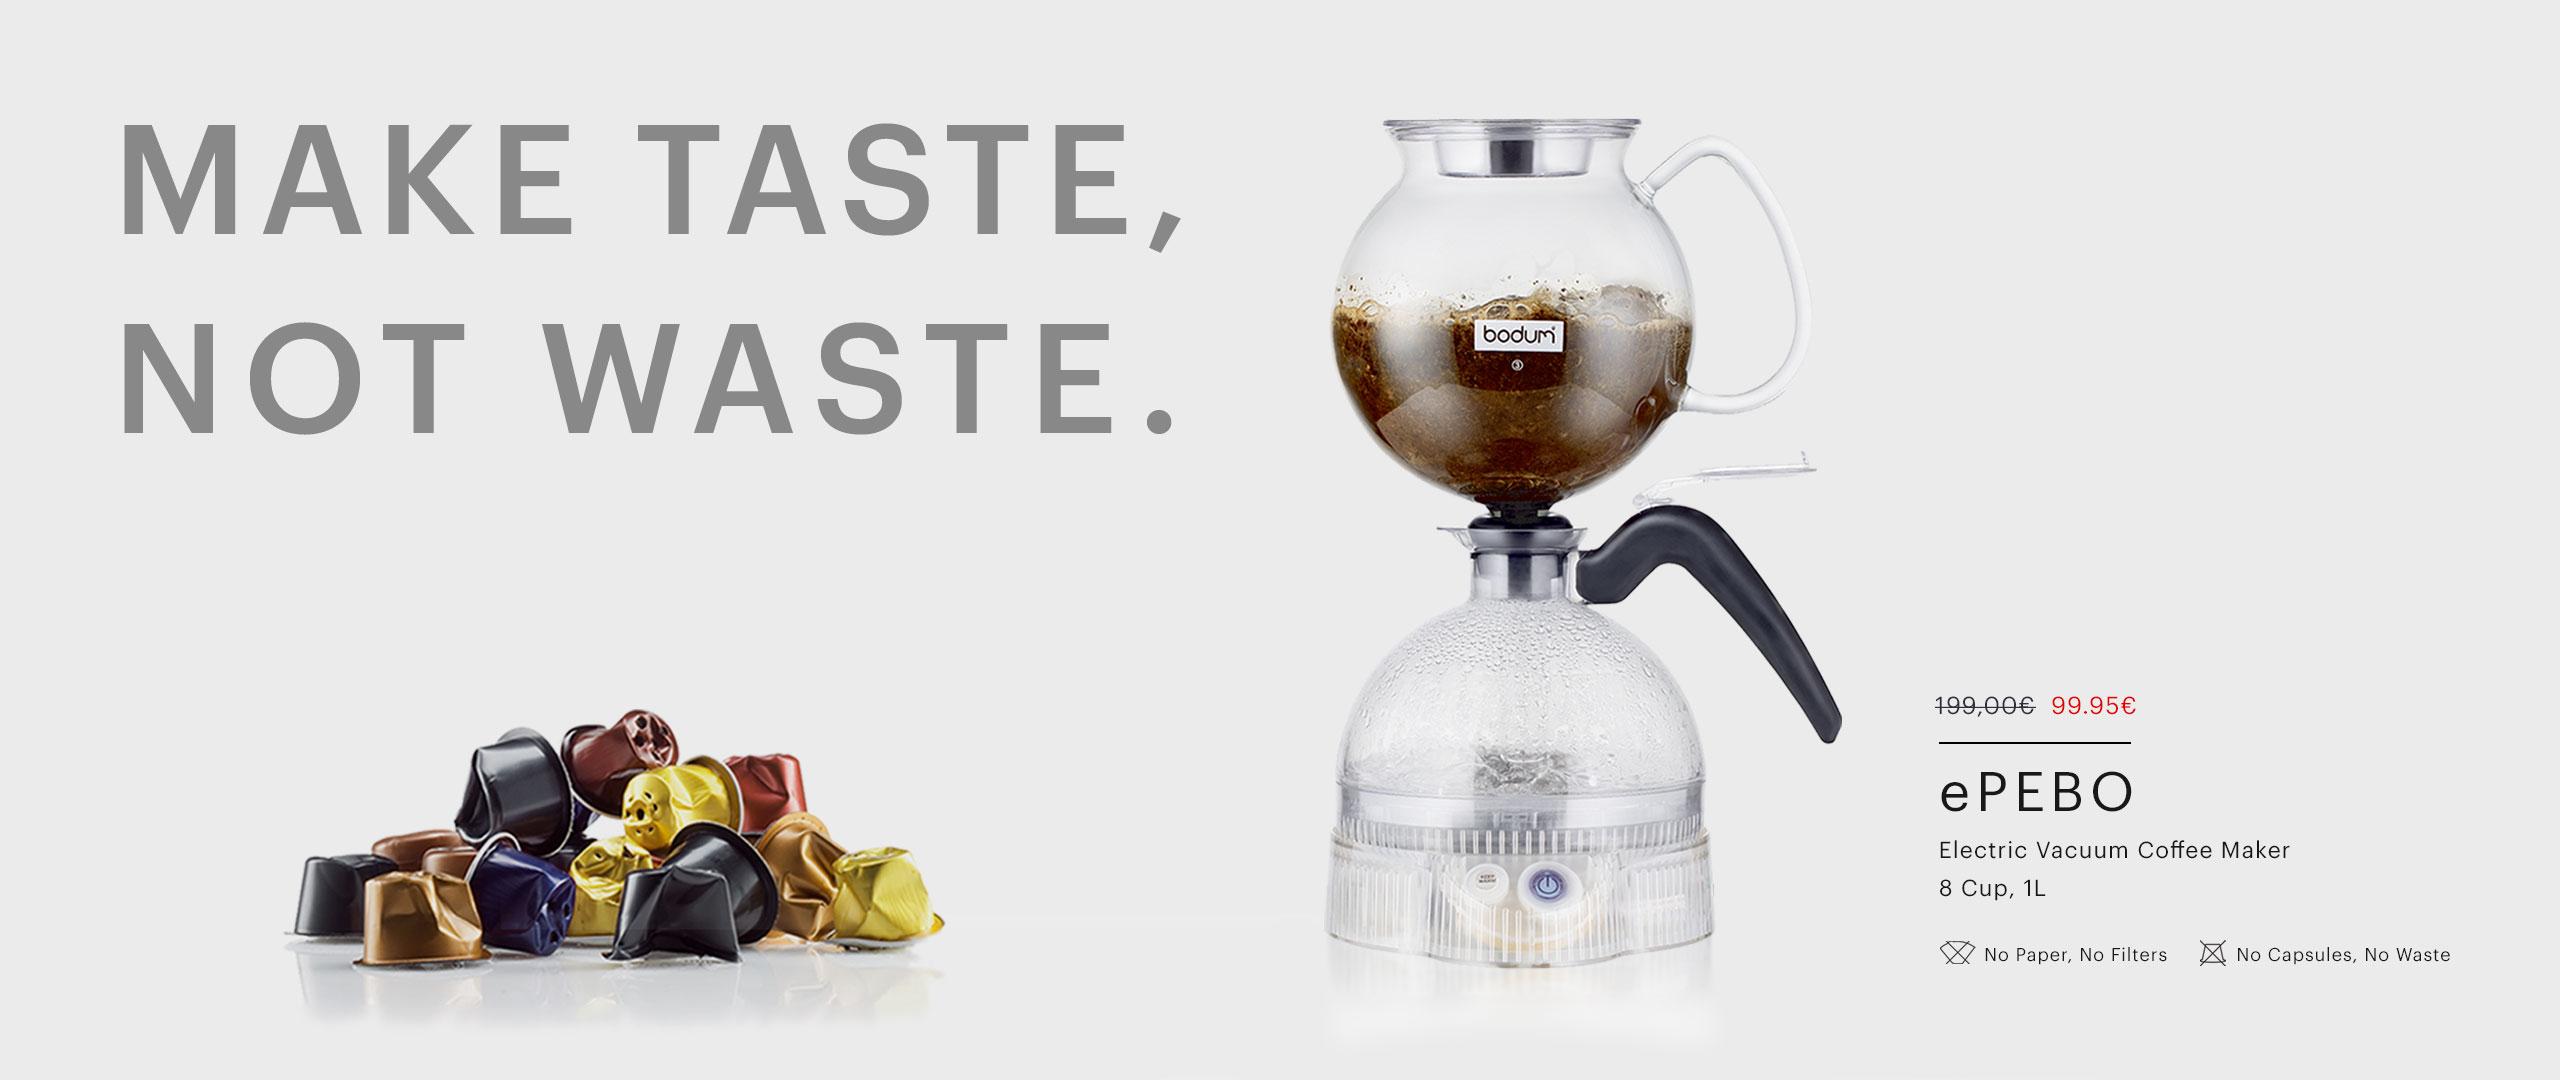 BEU [EN-EURO] - Make Taste Not Waste ePEBO